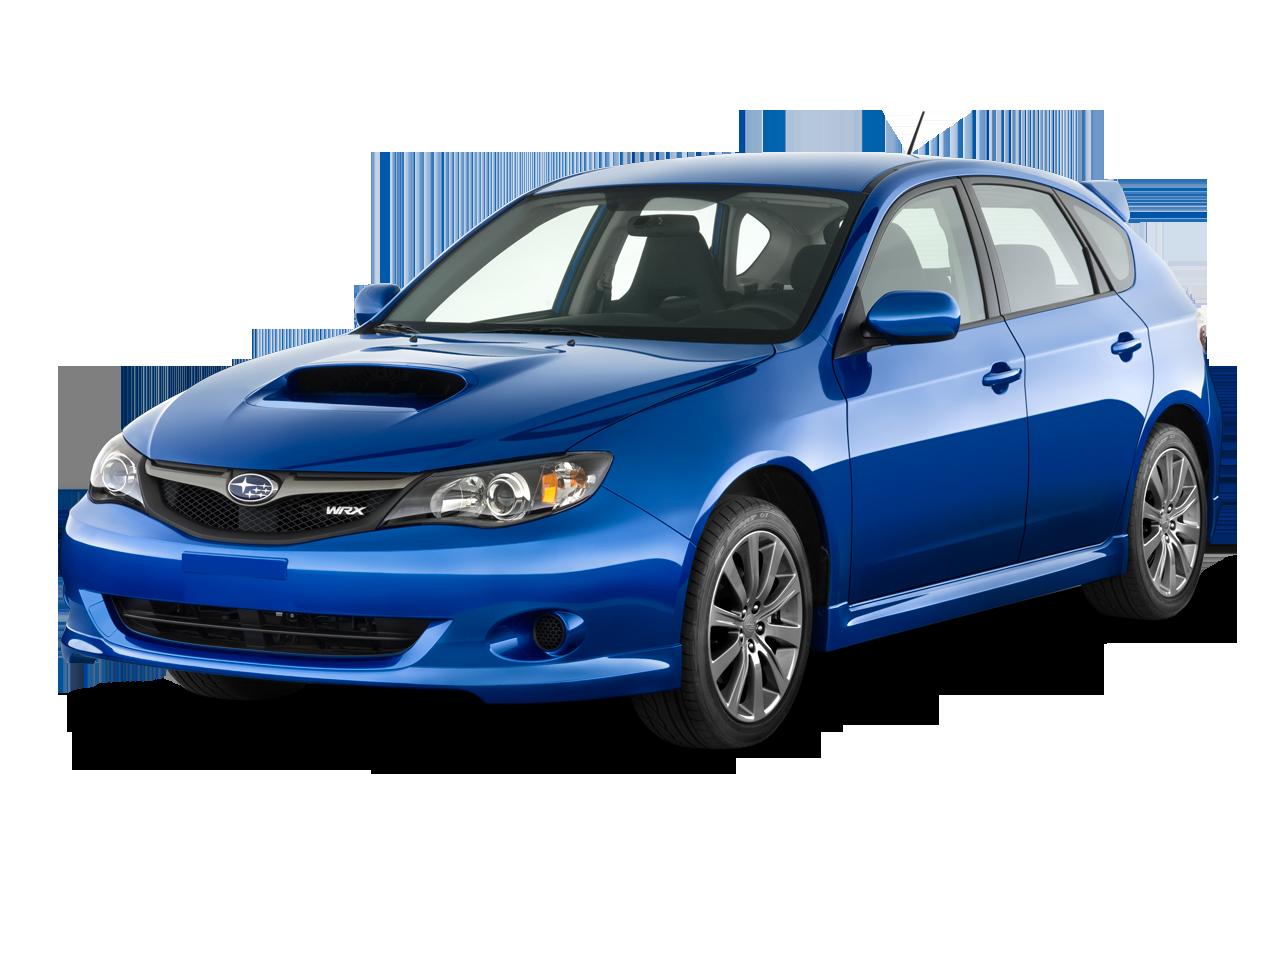 2009 Subaru Impreza Wrx Subaru Sports Hatchback Review